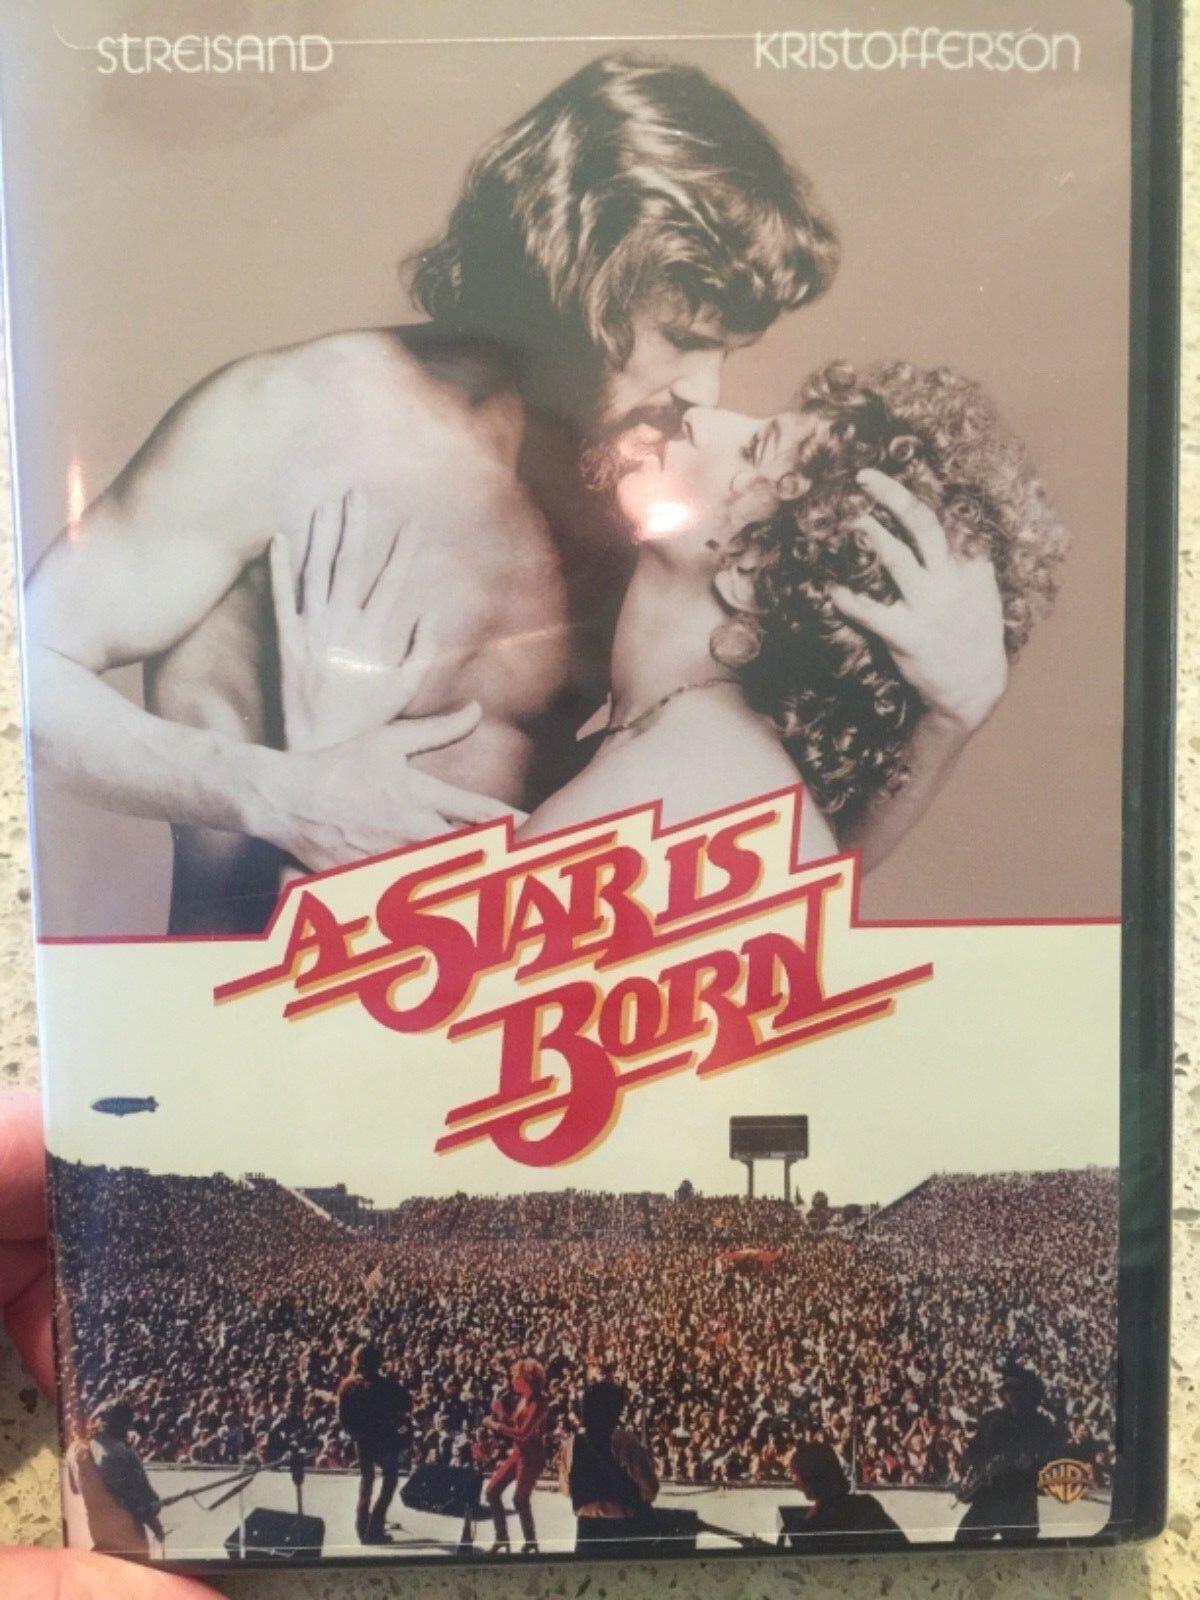 A Star Is Born DVD, 2005 Barbra Streisand Kris Kristofferson New Sealed - $27.97